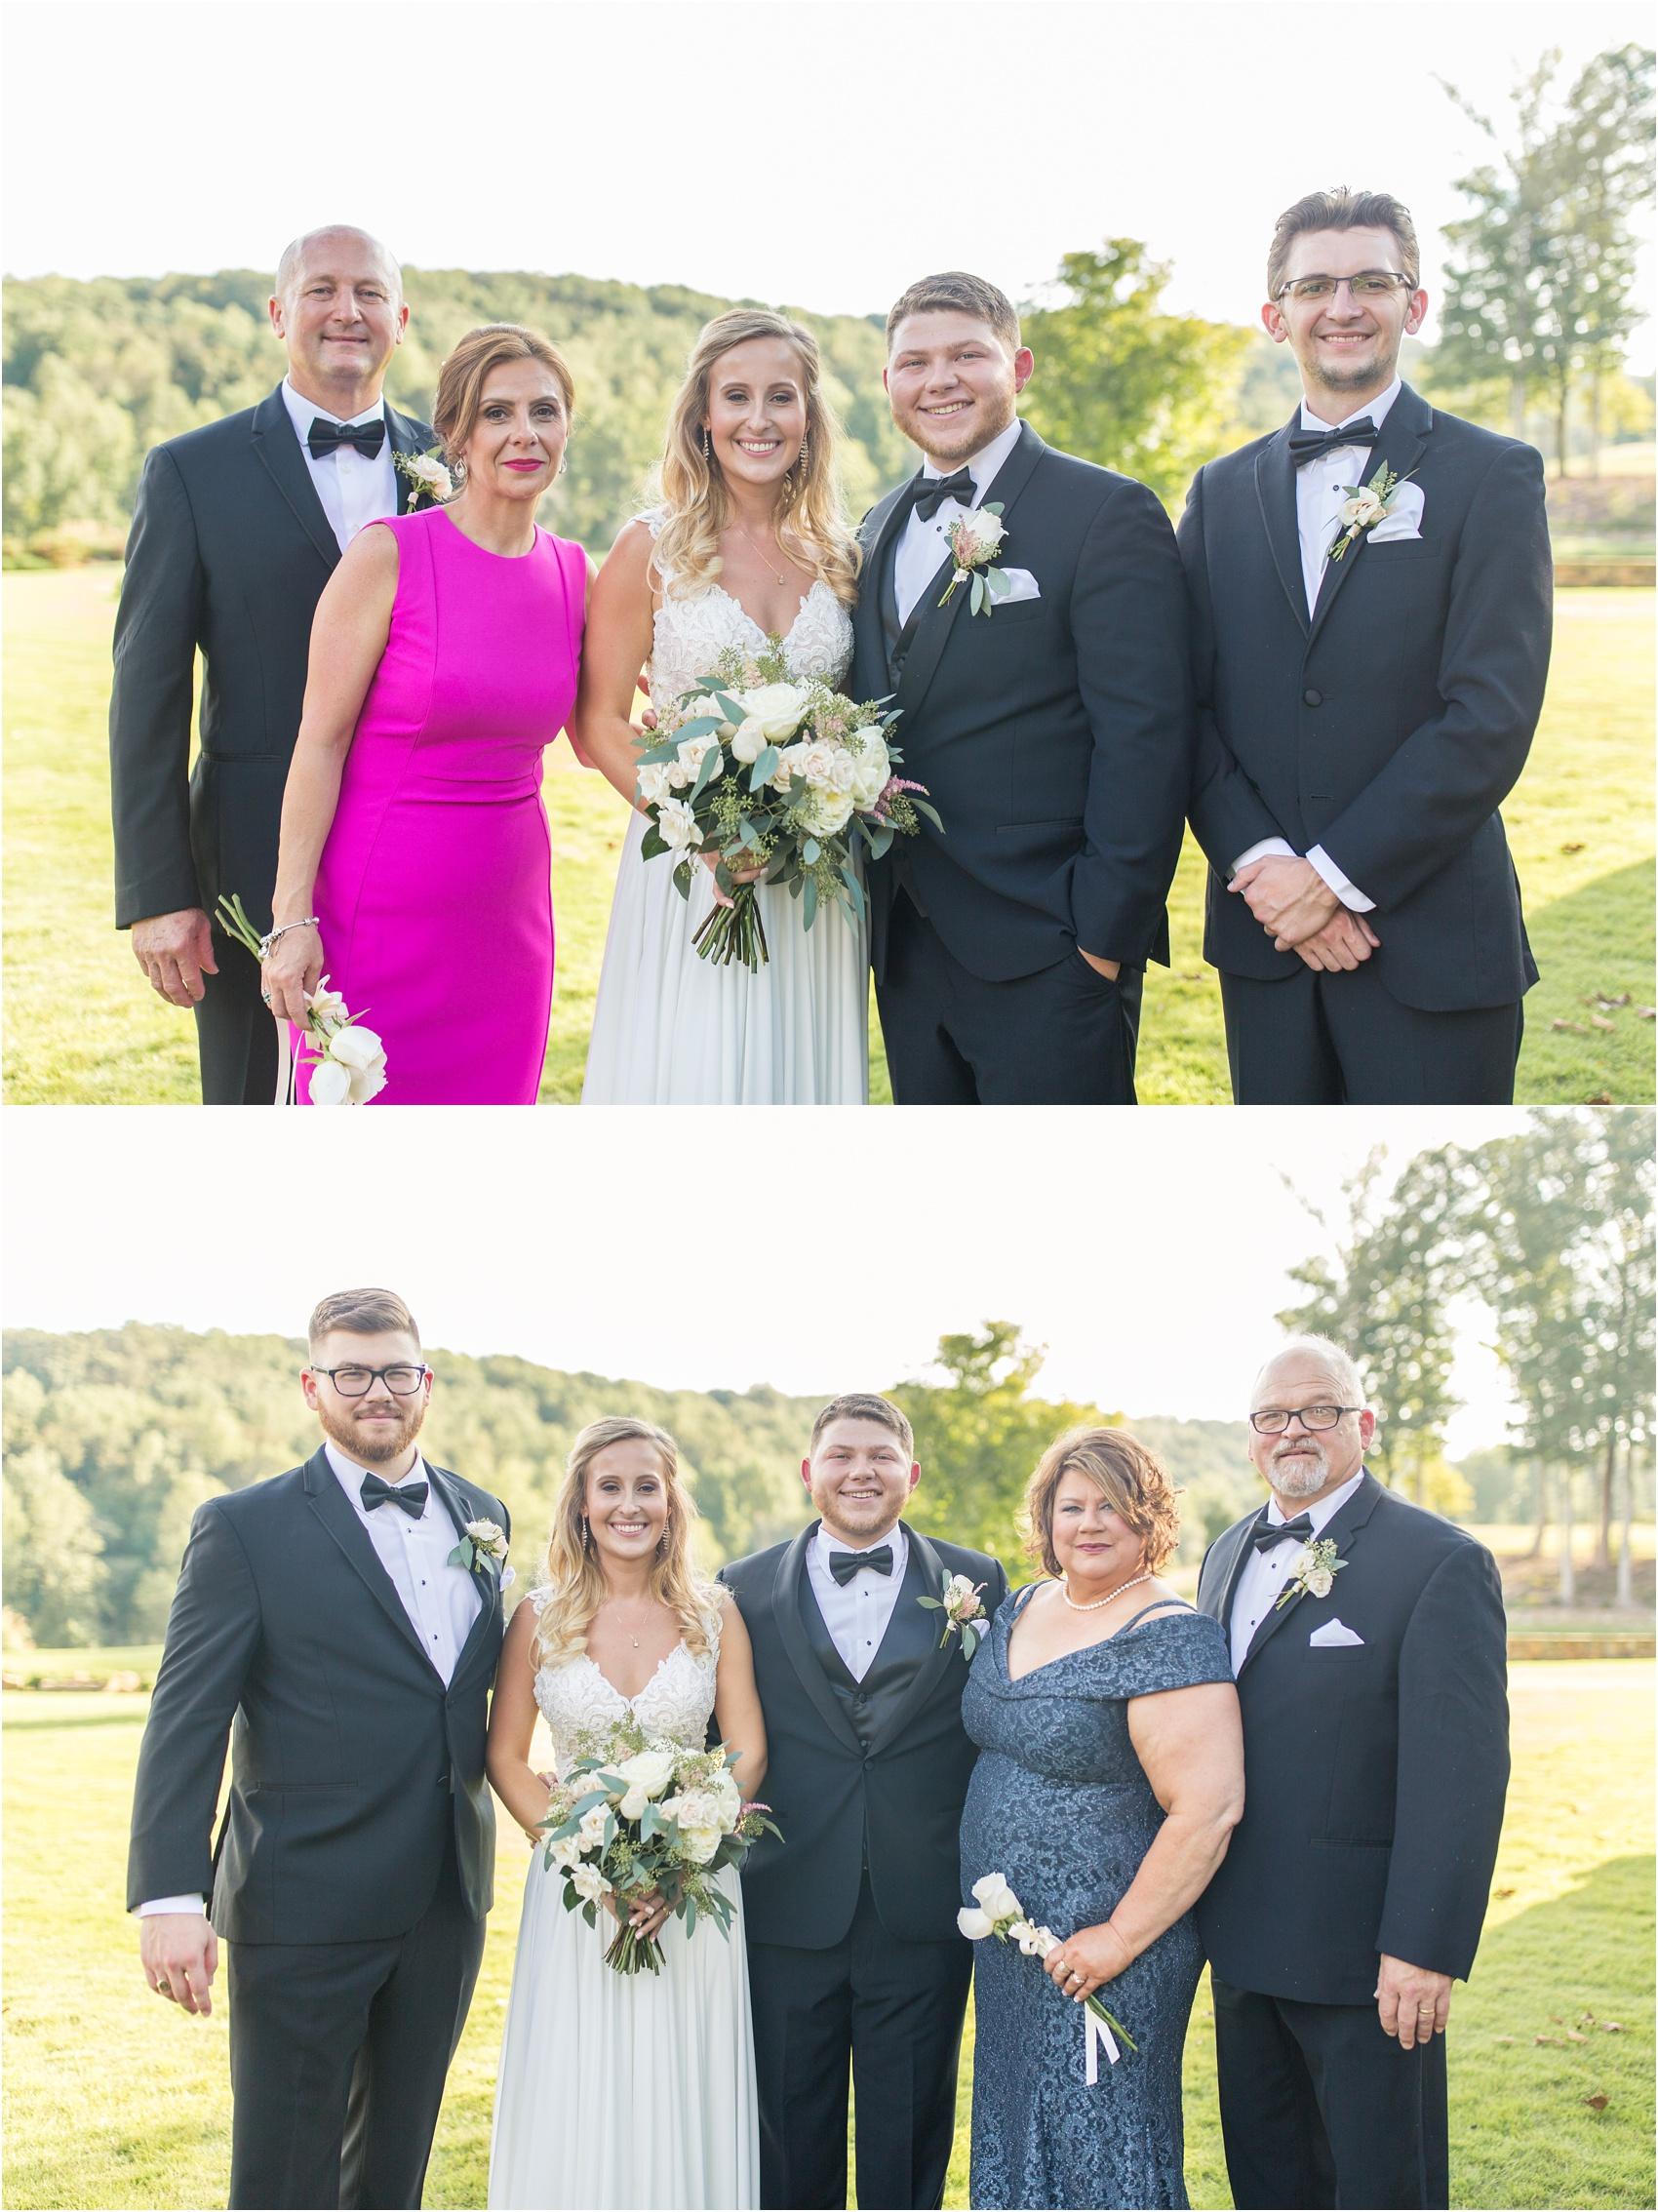 Savannah Eve Photography- Jurek-Woodworth Wedding- Sneak Peek-46.jpg